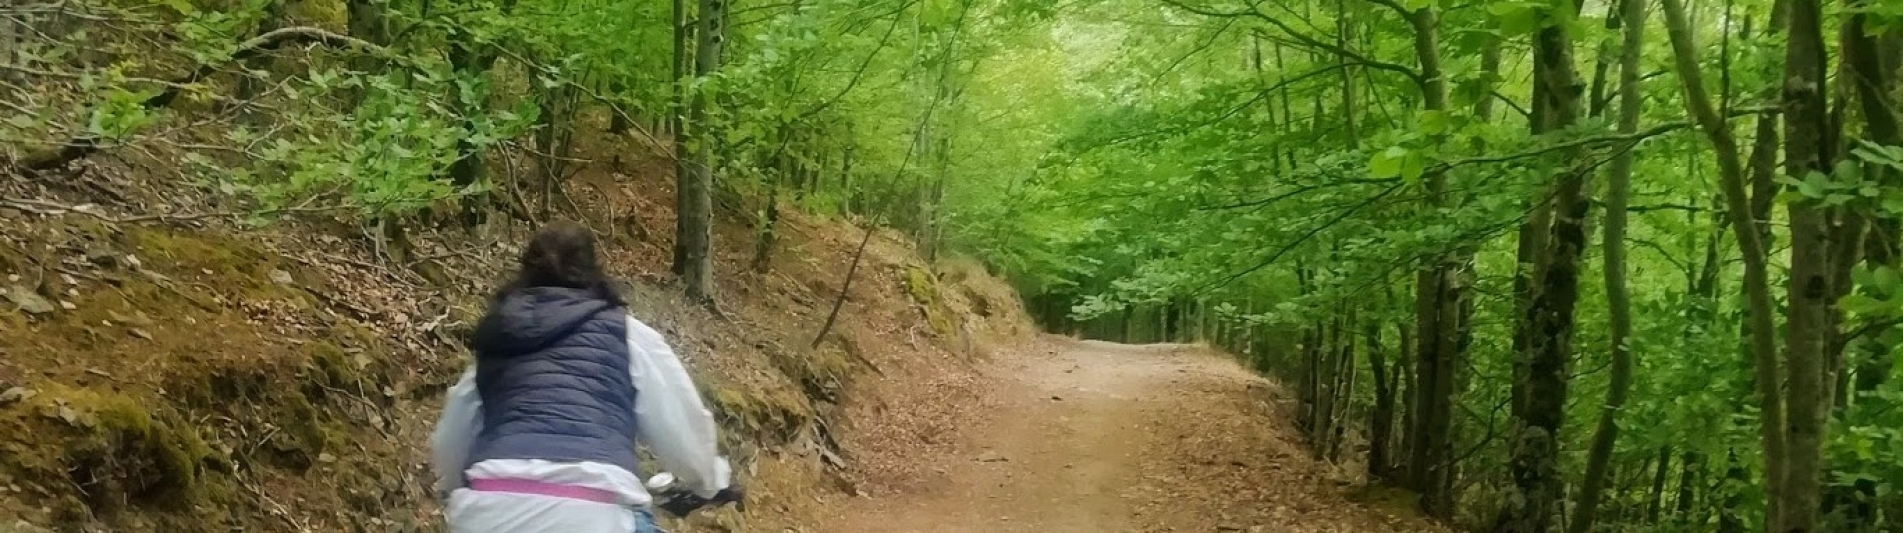 serra-estrela-passeio-bicicleta-9